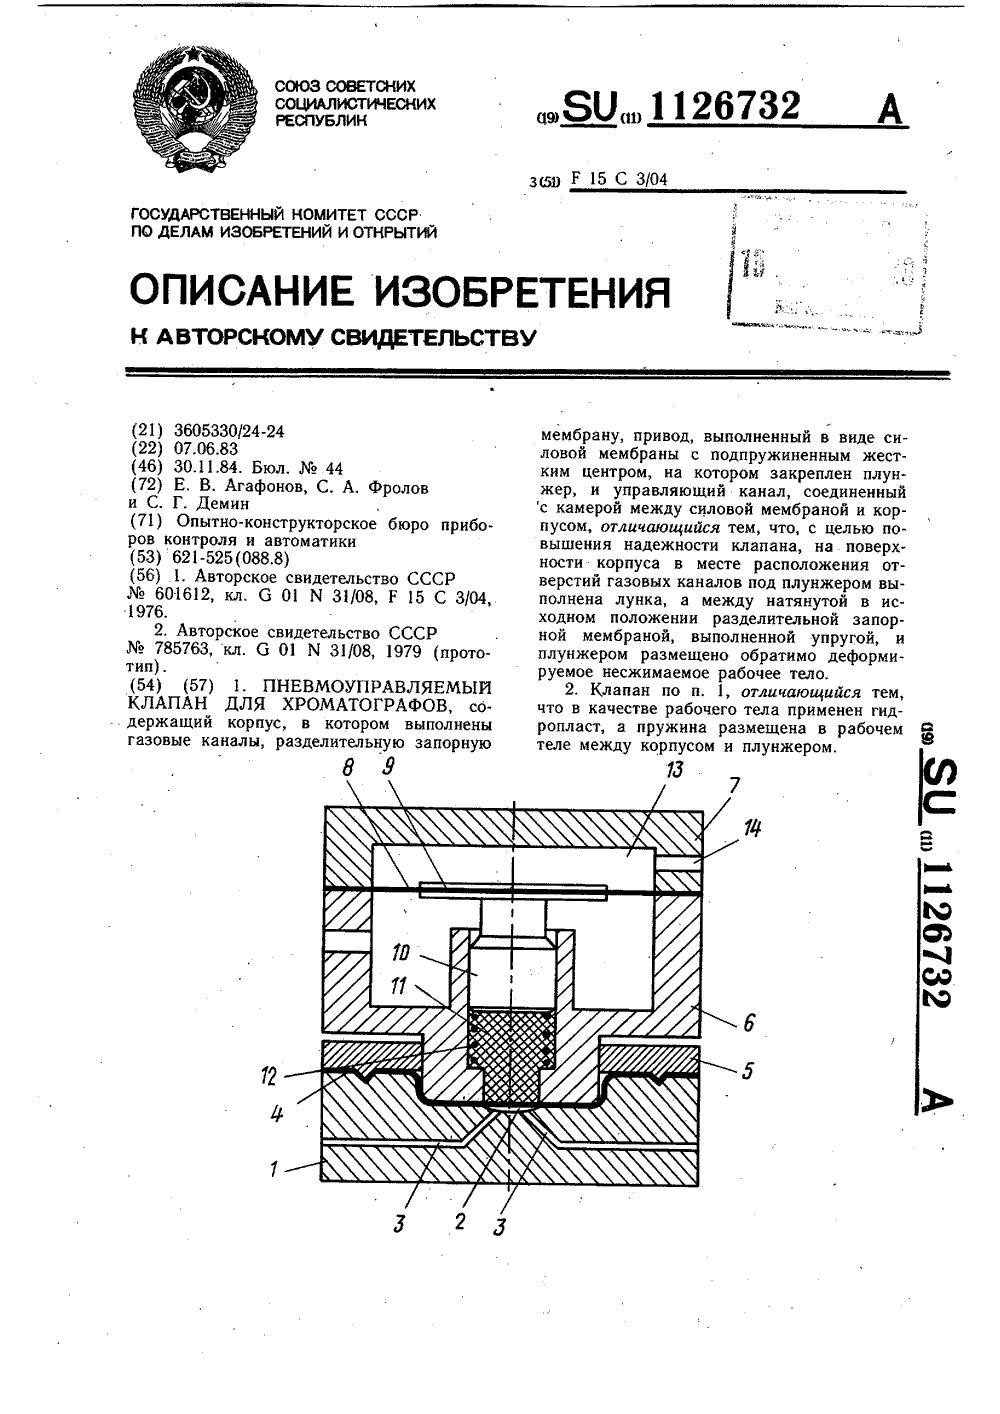 Опорная площадка корпуса хроматографа